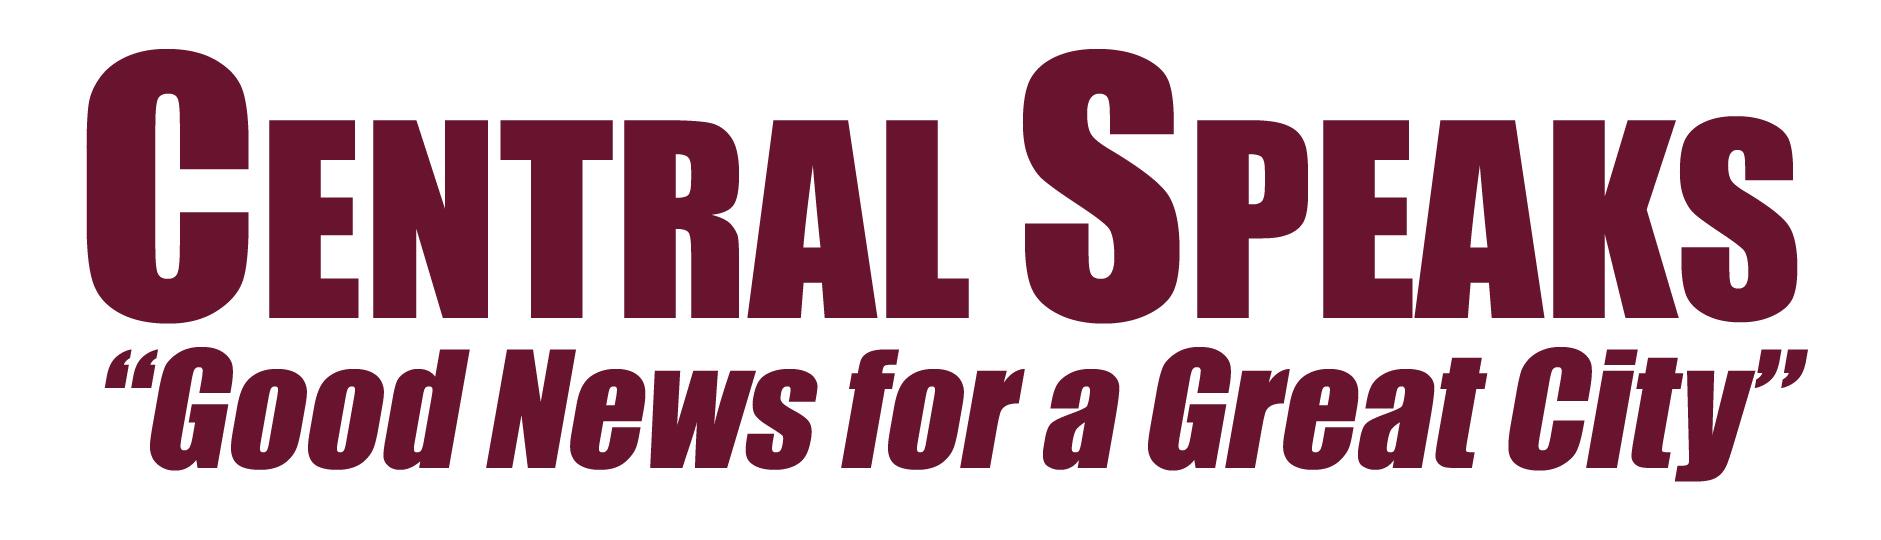 CentralSpeaks.com